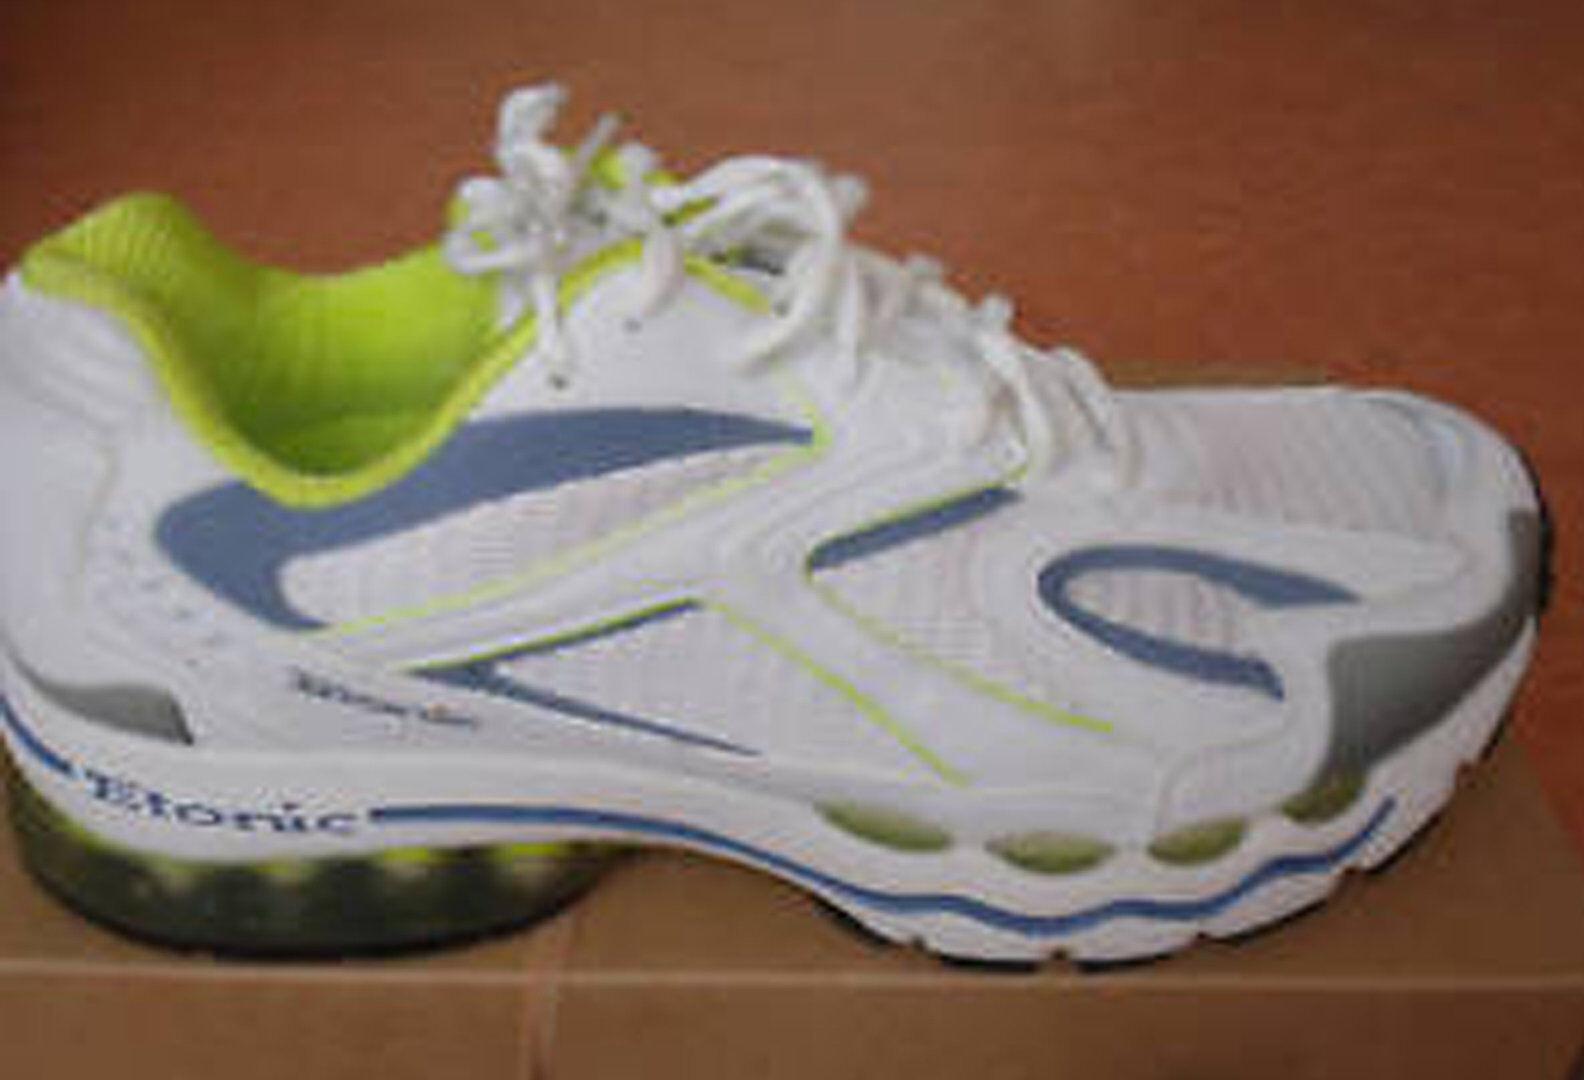 Scarpe da corsa corsa corsa da donna Scarpe Jogging Modello ETONIC JEPARA-SVENDITA  8221b2